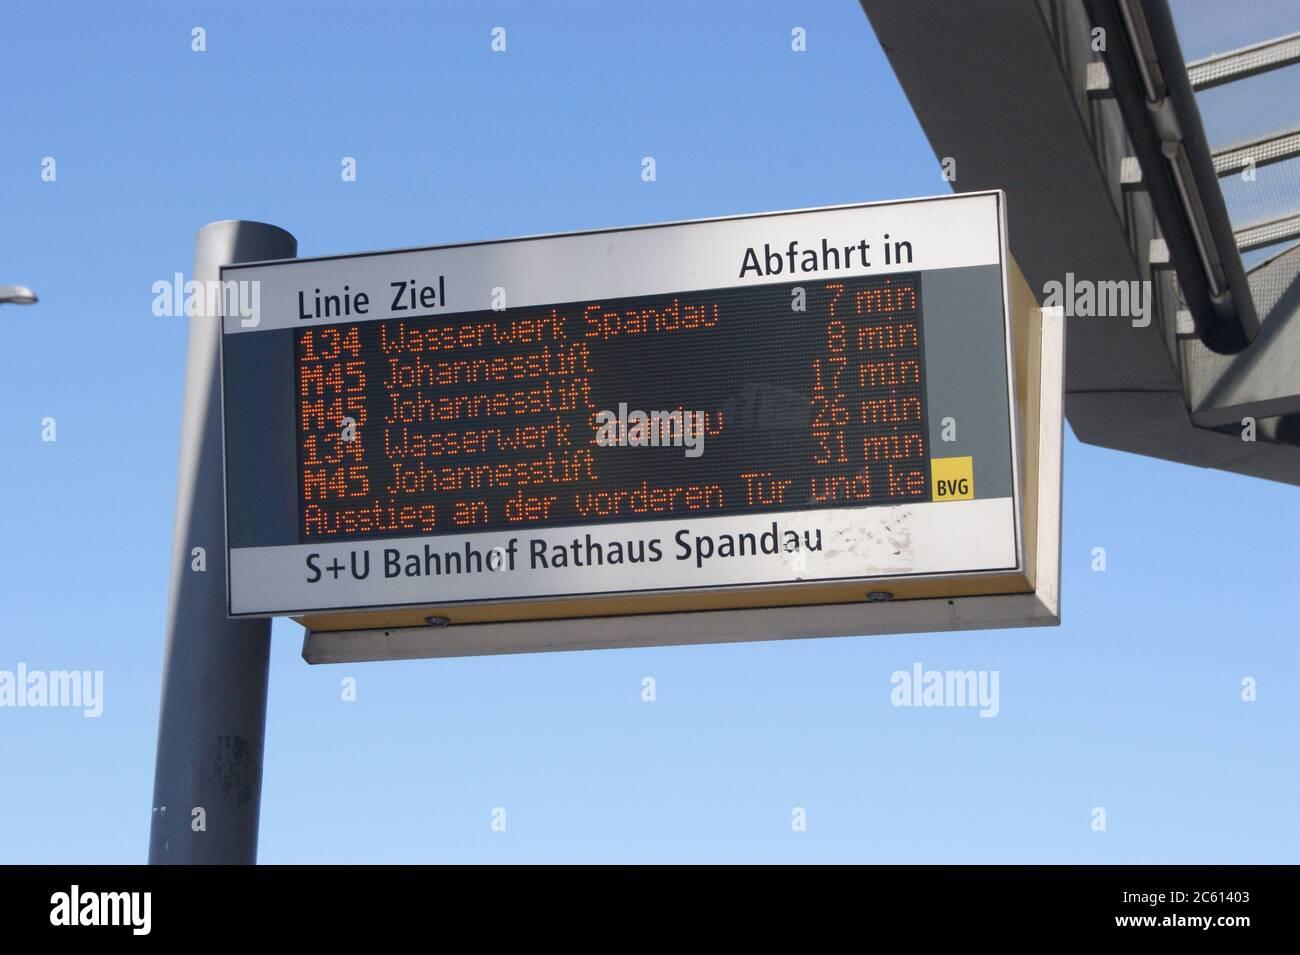 BVG-Fahranzeige am Rathaus Spandau Stock Photo